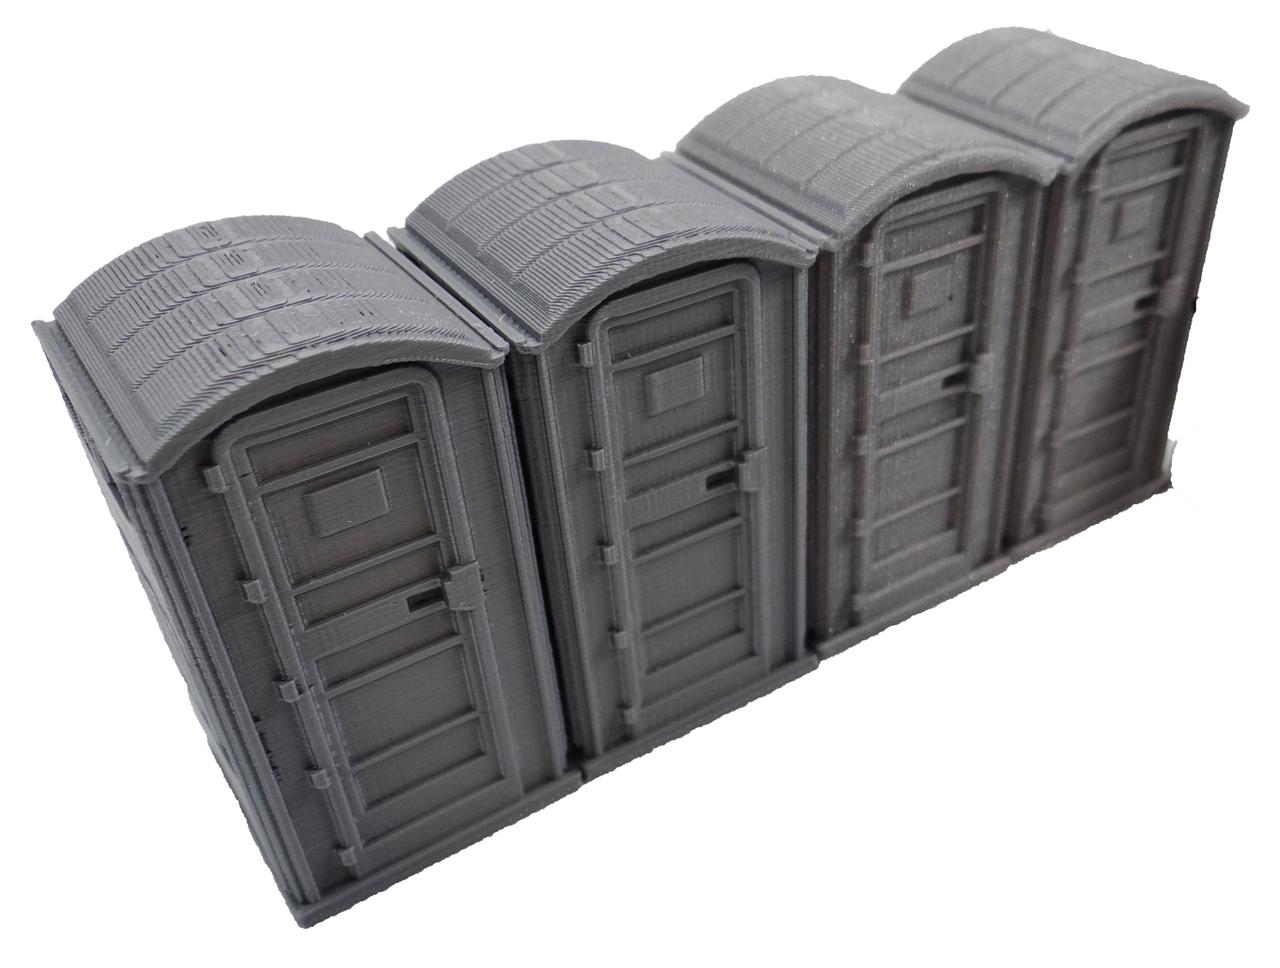 28mm Modern Porta Potty 3ea